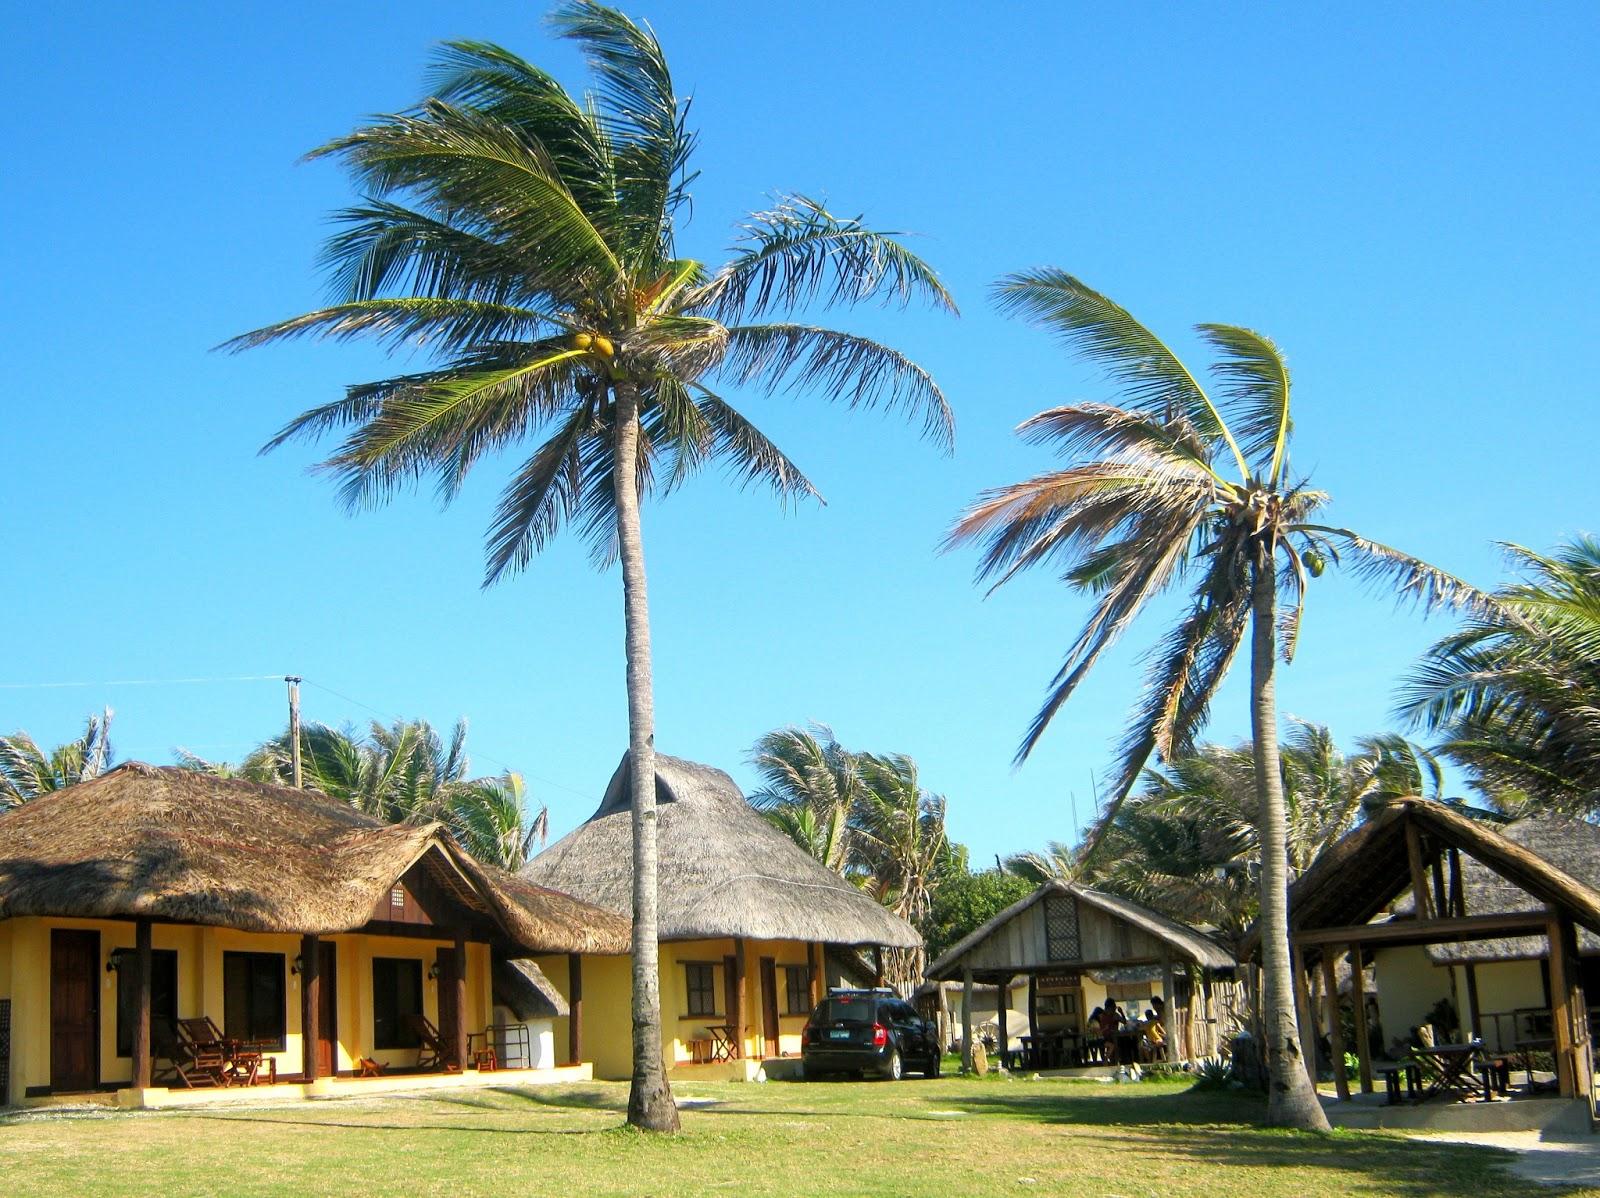 Casa Consuelo Pagudpud Ilocos